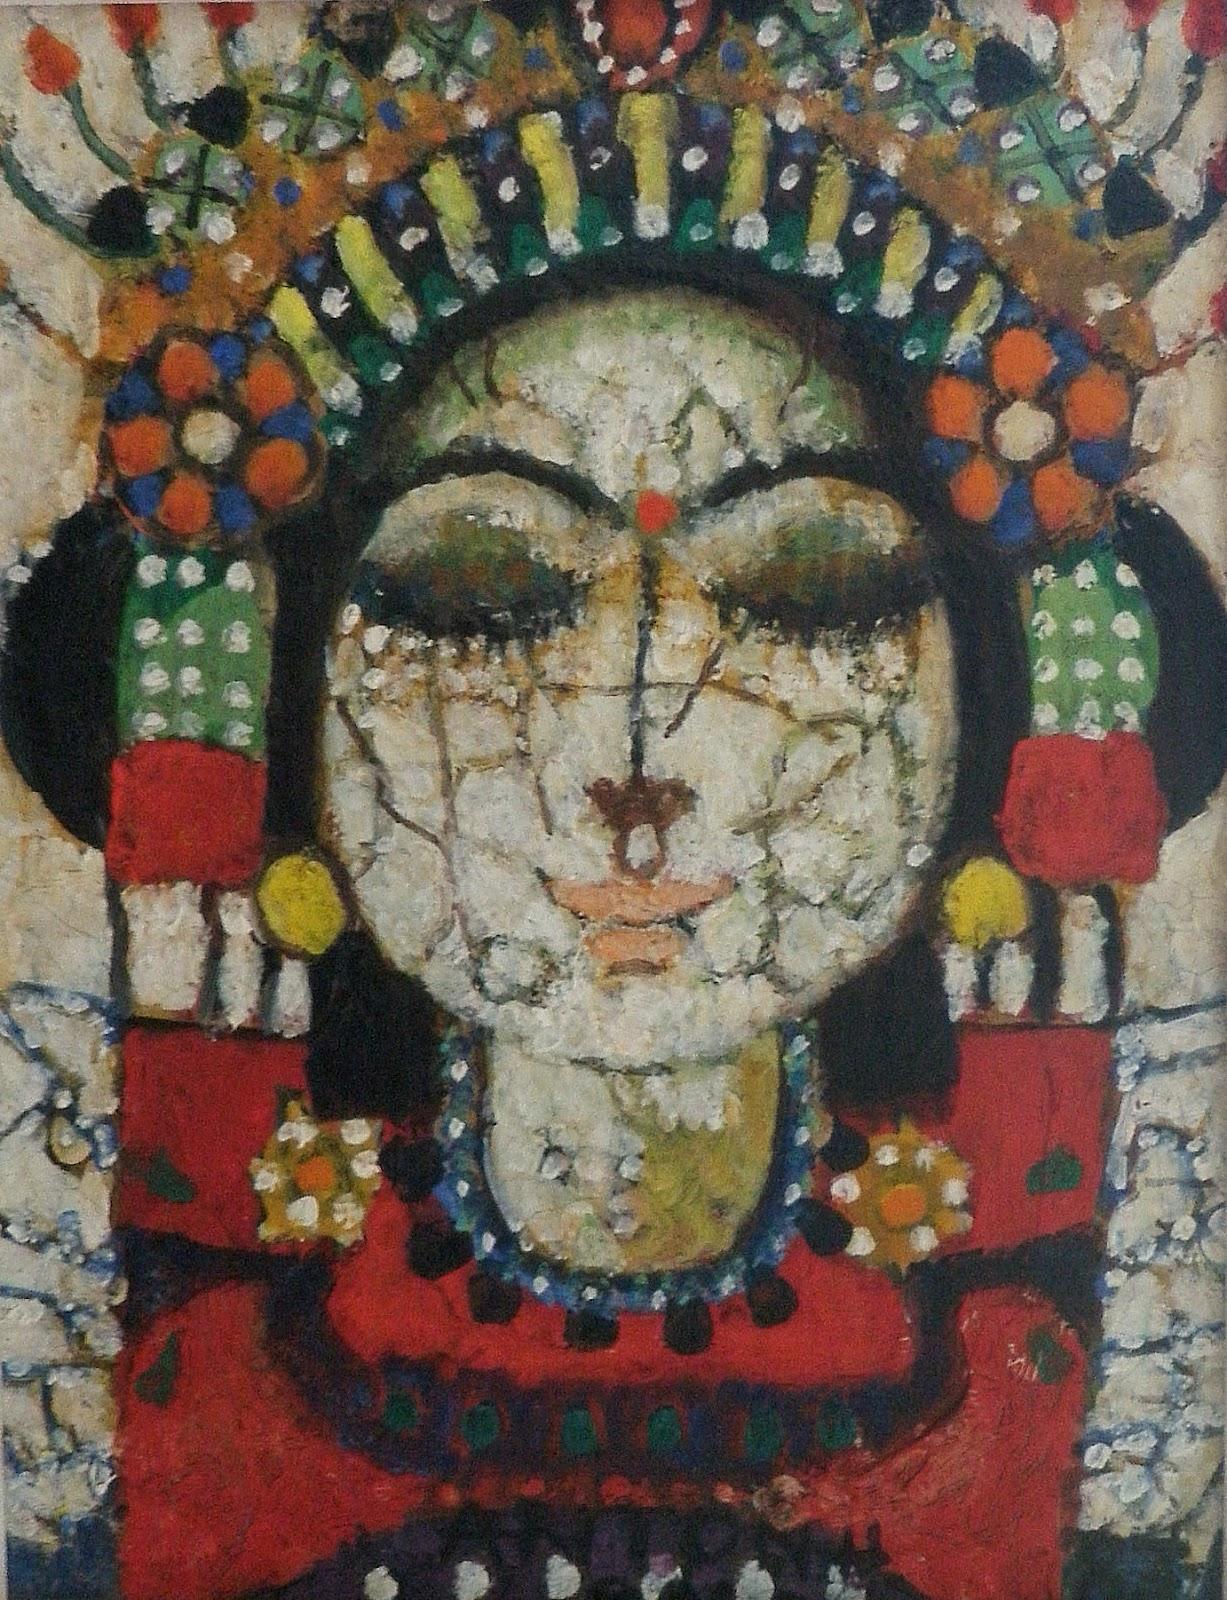 Footsteps Jotaro S Travels Photo Gallery Indonesia Balinese Art Pg 2